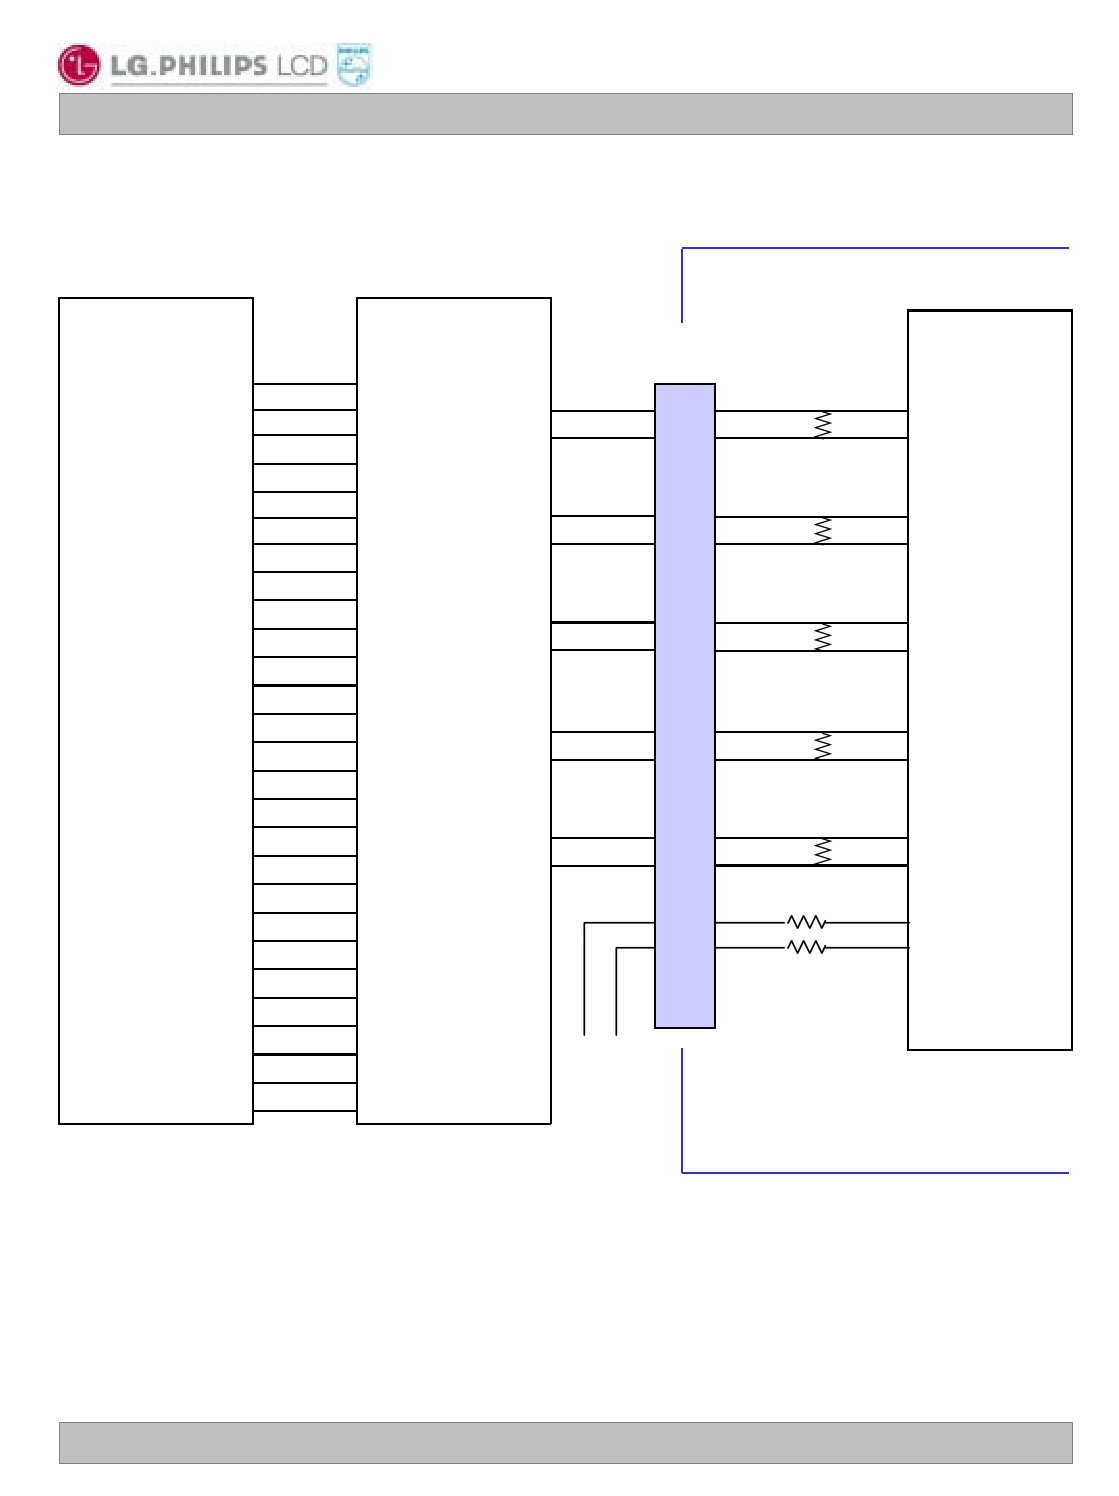 LC320W01-SL05 arduino